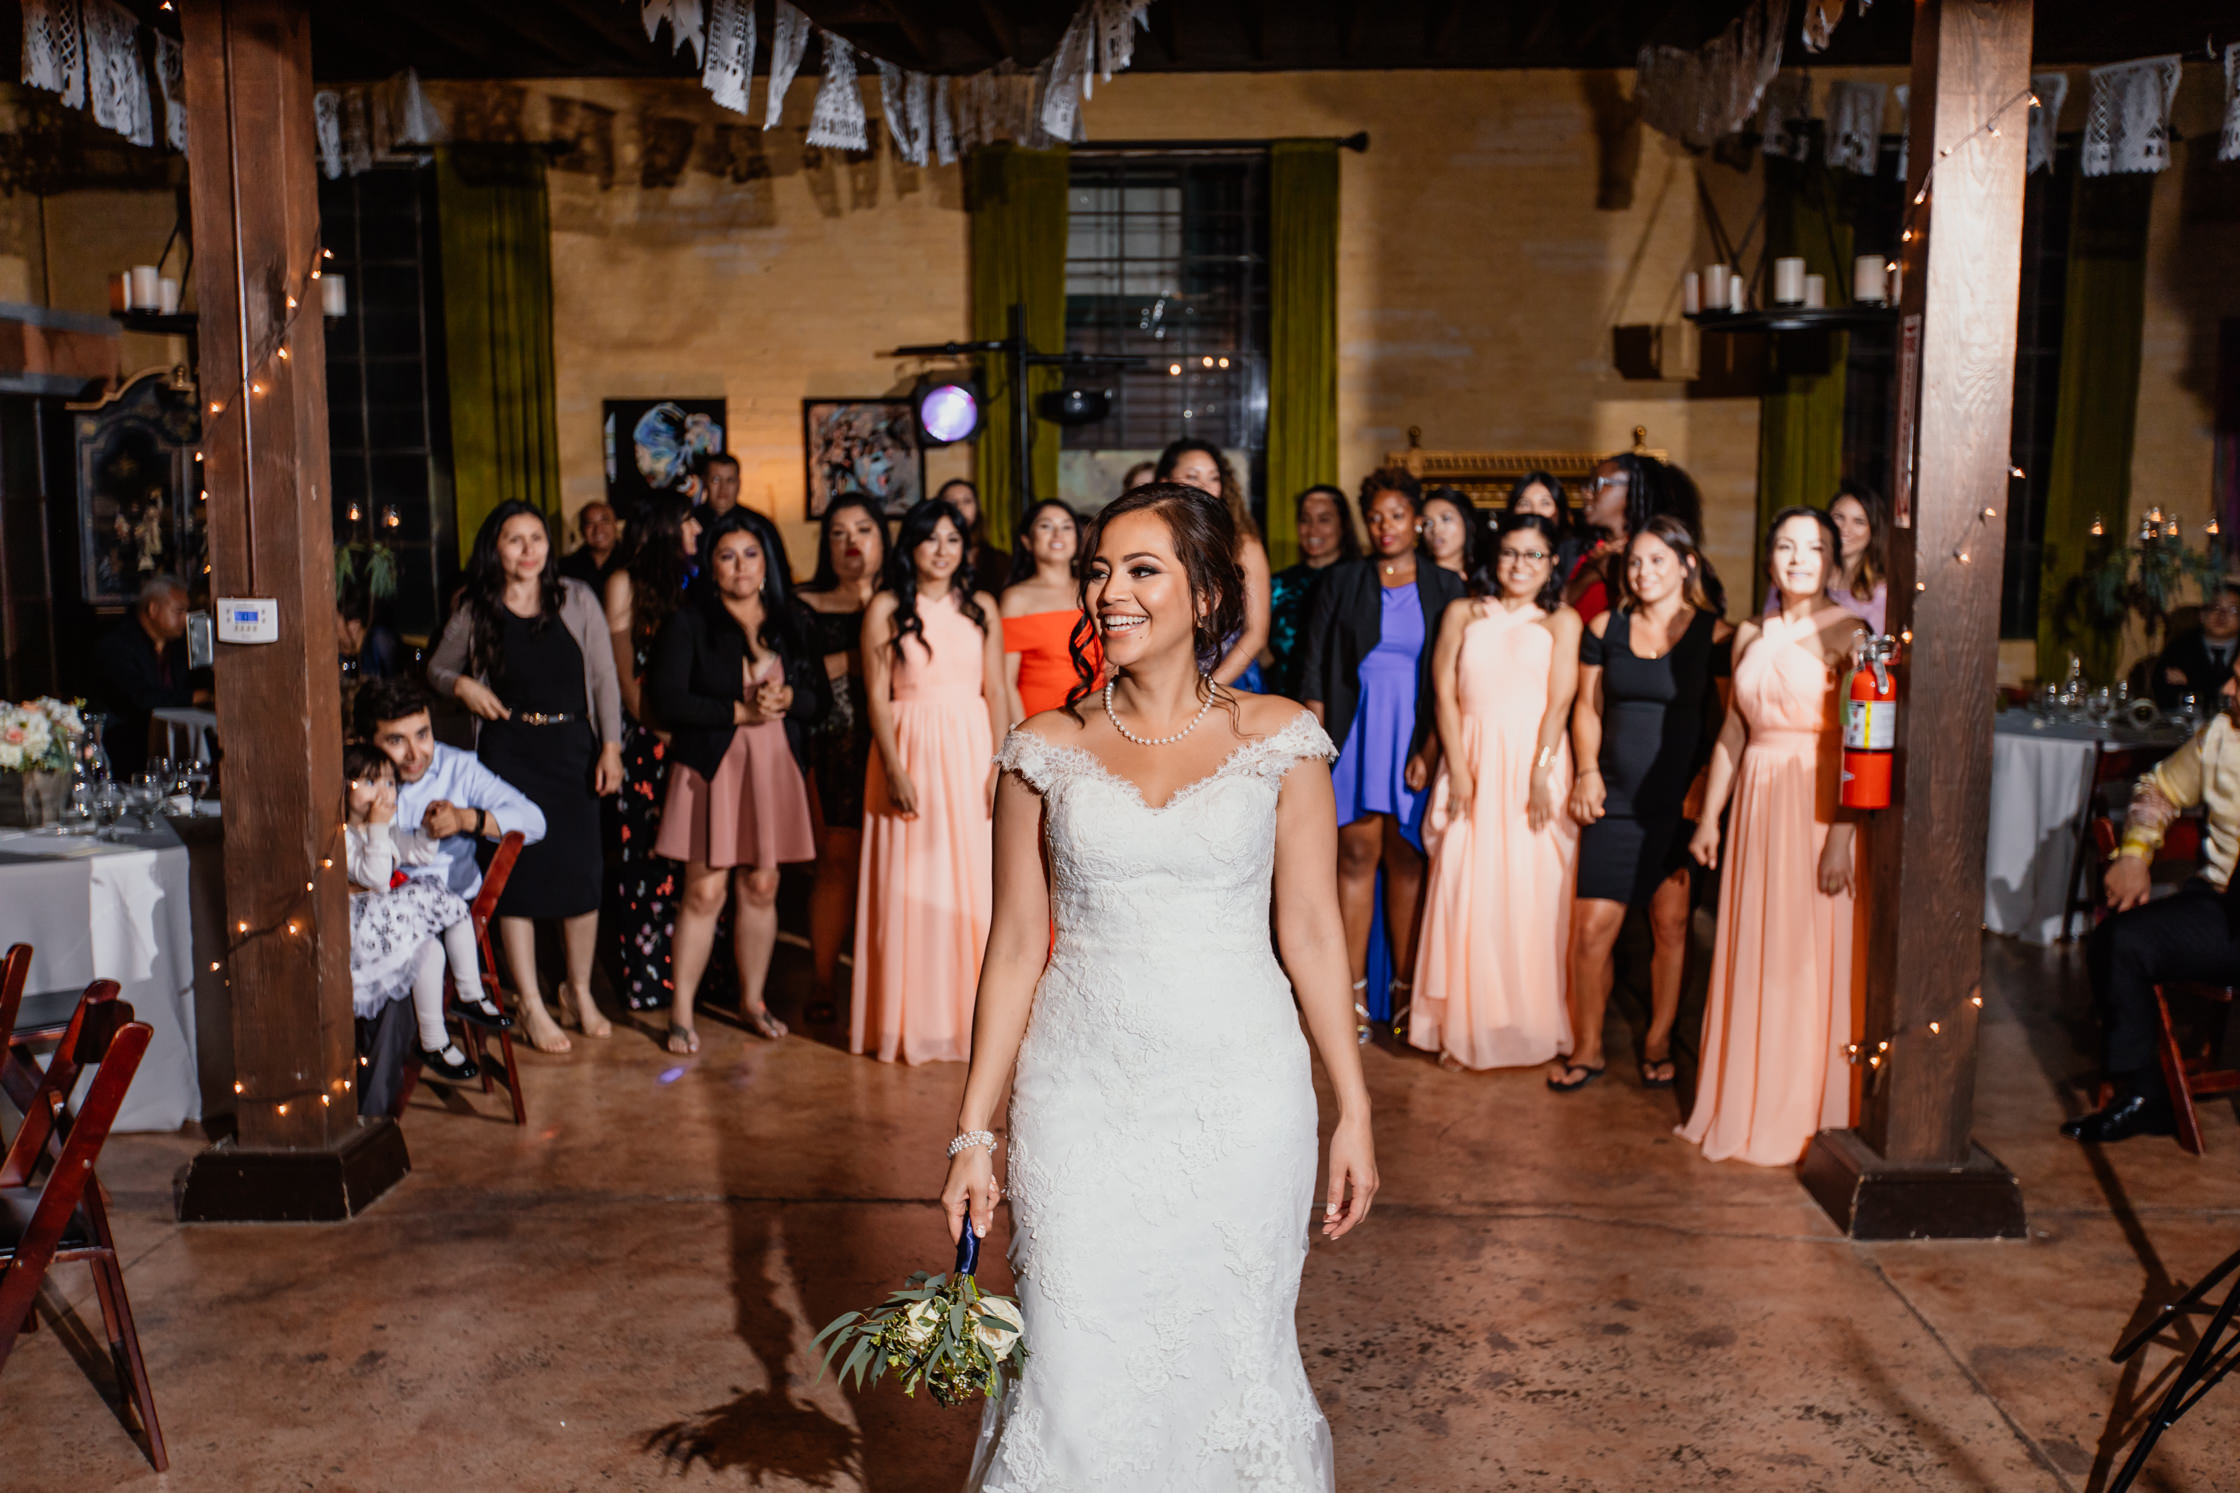 luis_joanna_wedding-118.jpg